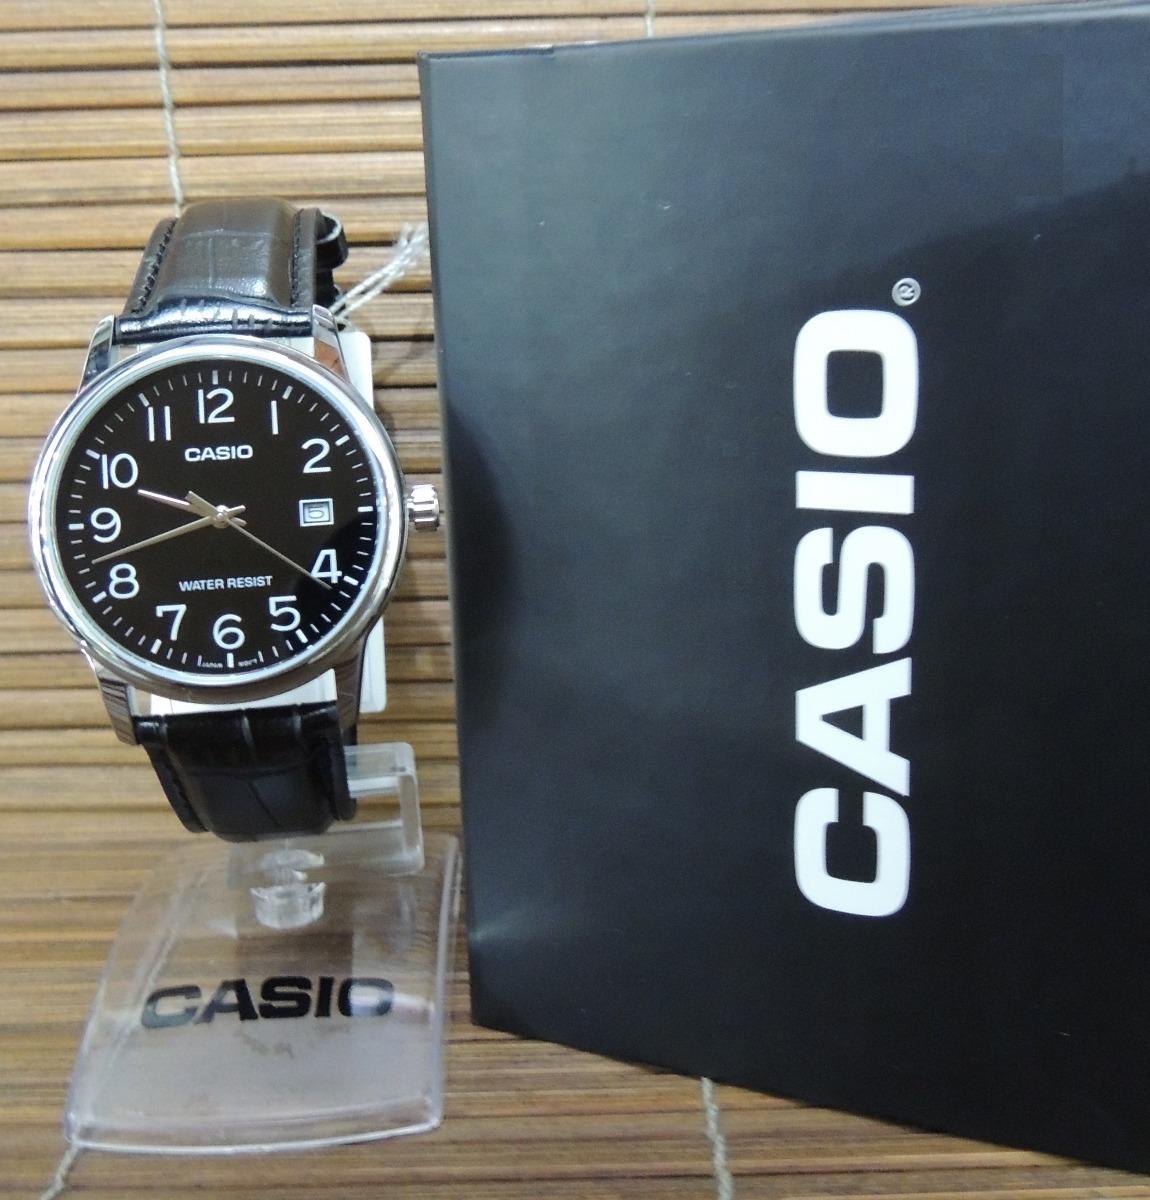 0c968ab66b8 Relógio Casio Masculino - Mtp-v002l-1budf (nf E Garantia) - R  174 ...